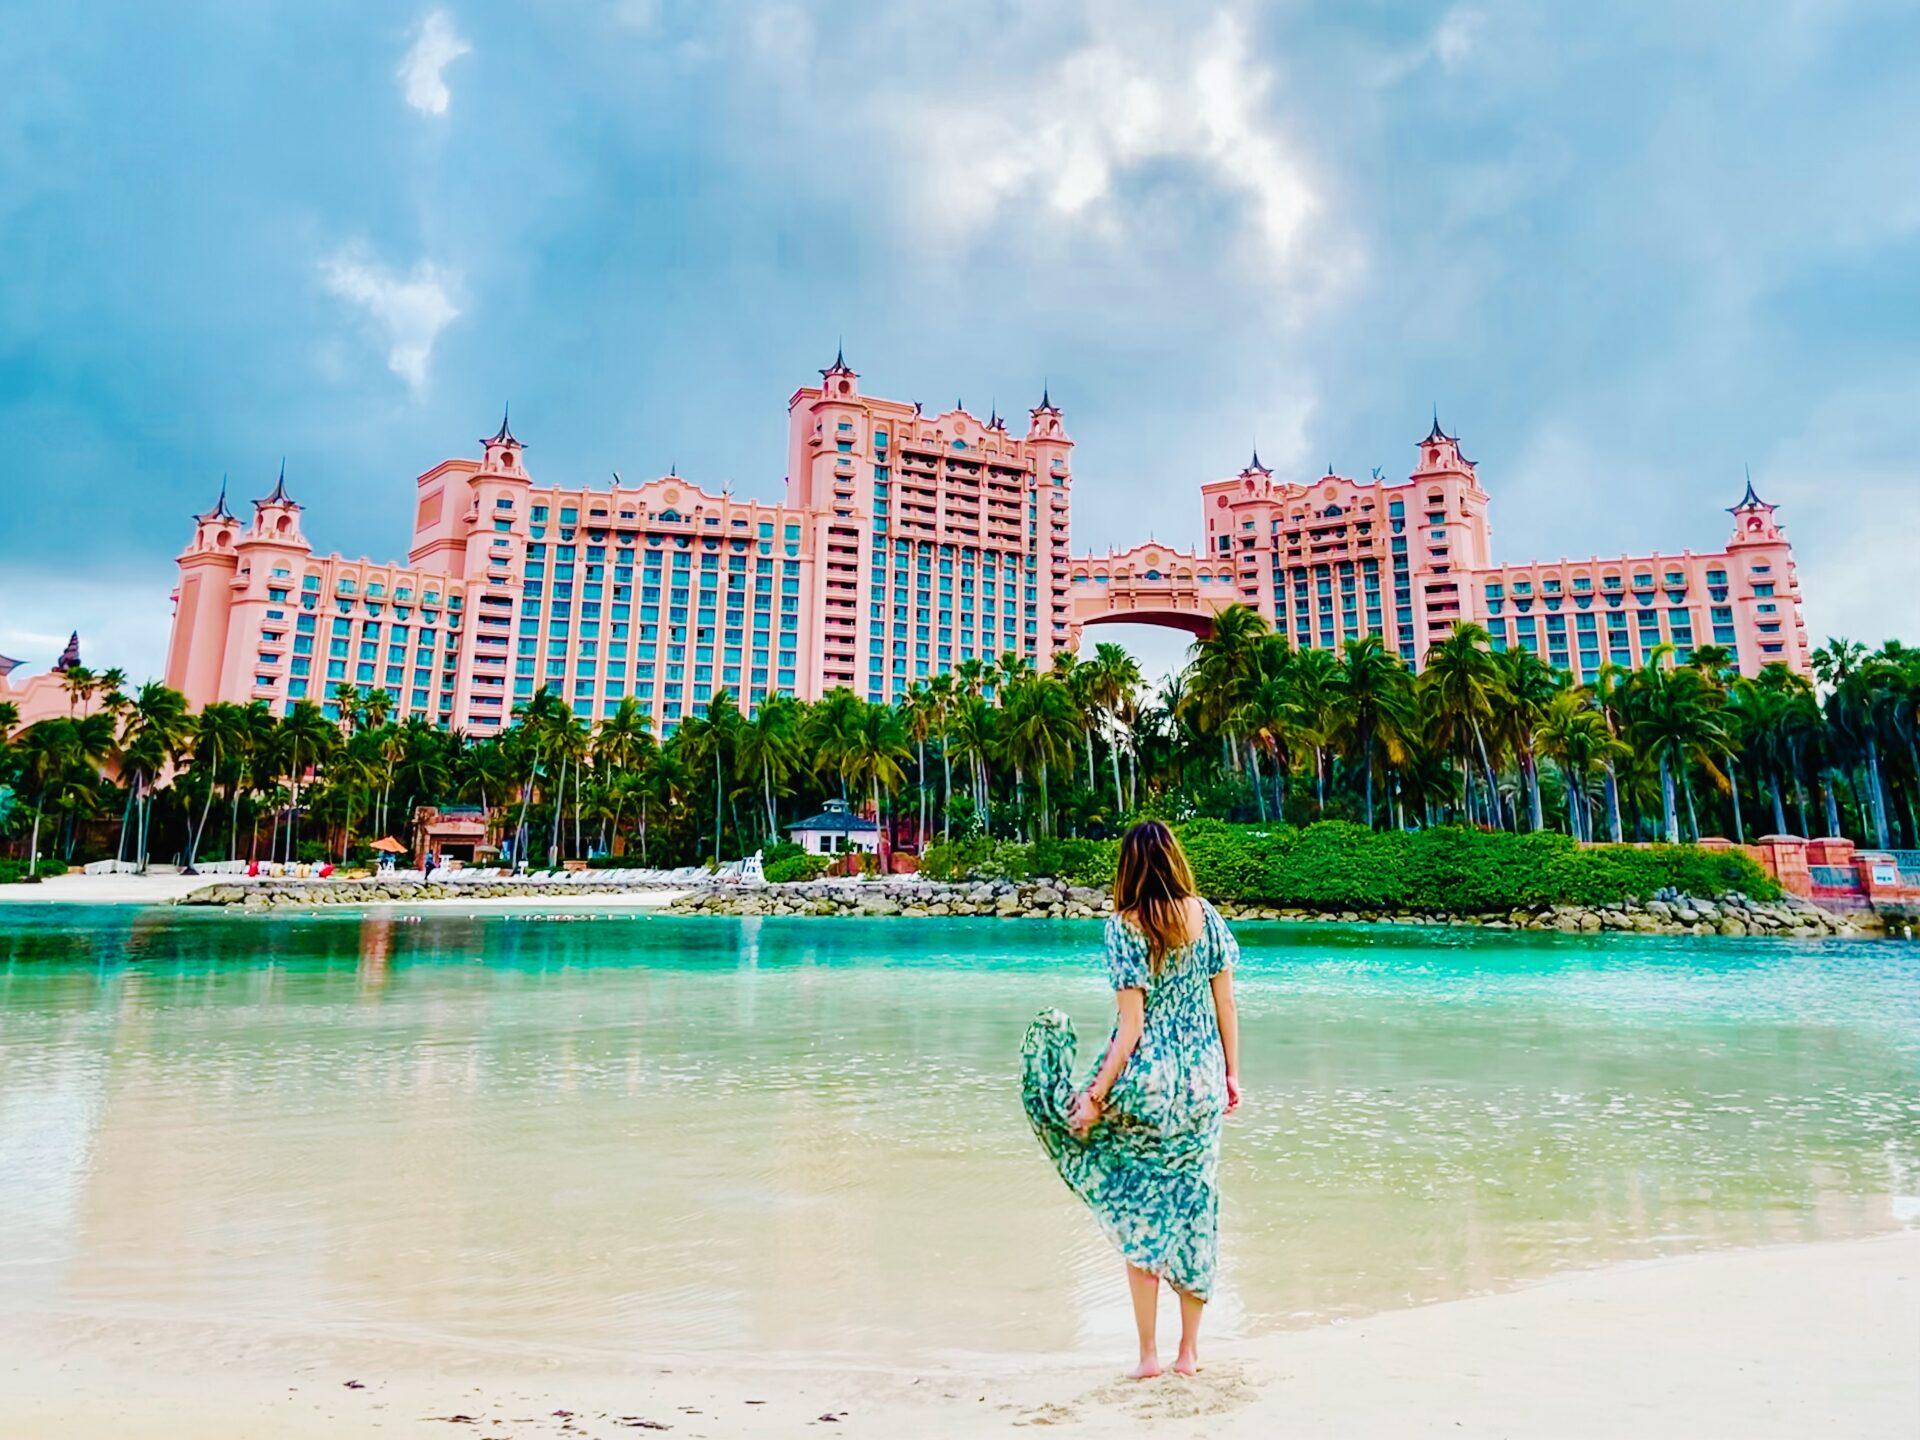 atlantis resort, atlantis bahamas, bahamas hotel, atlantis hotel, atlantis hotel review